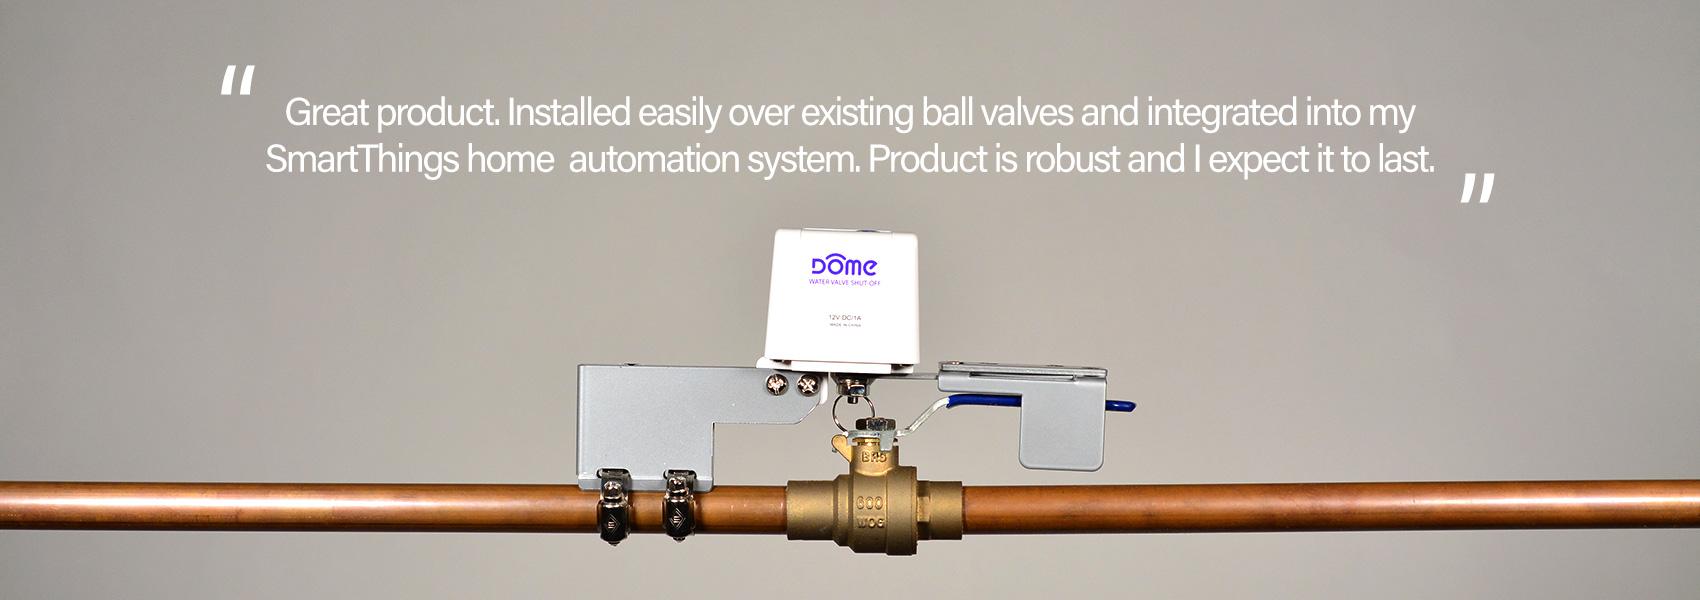 dome-water-valve.jpg